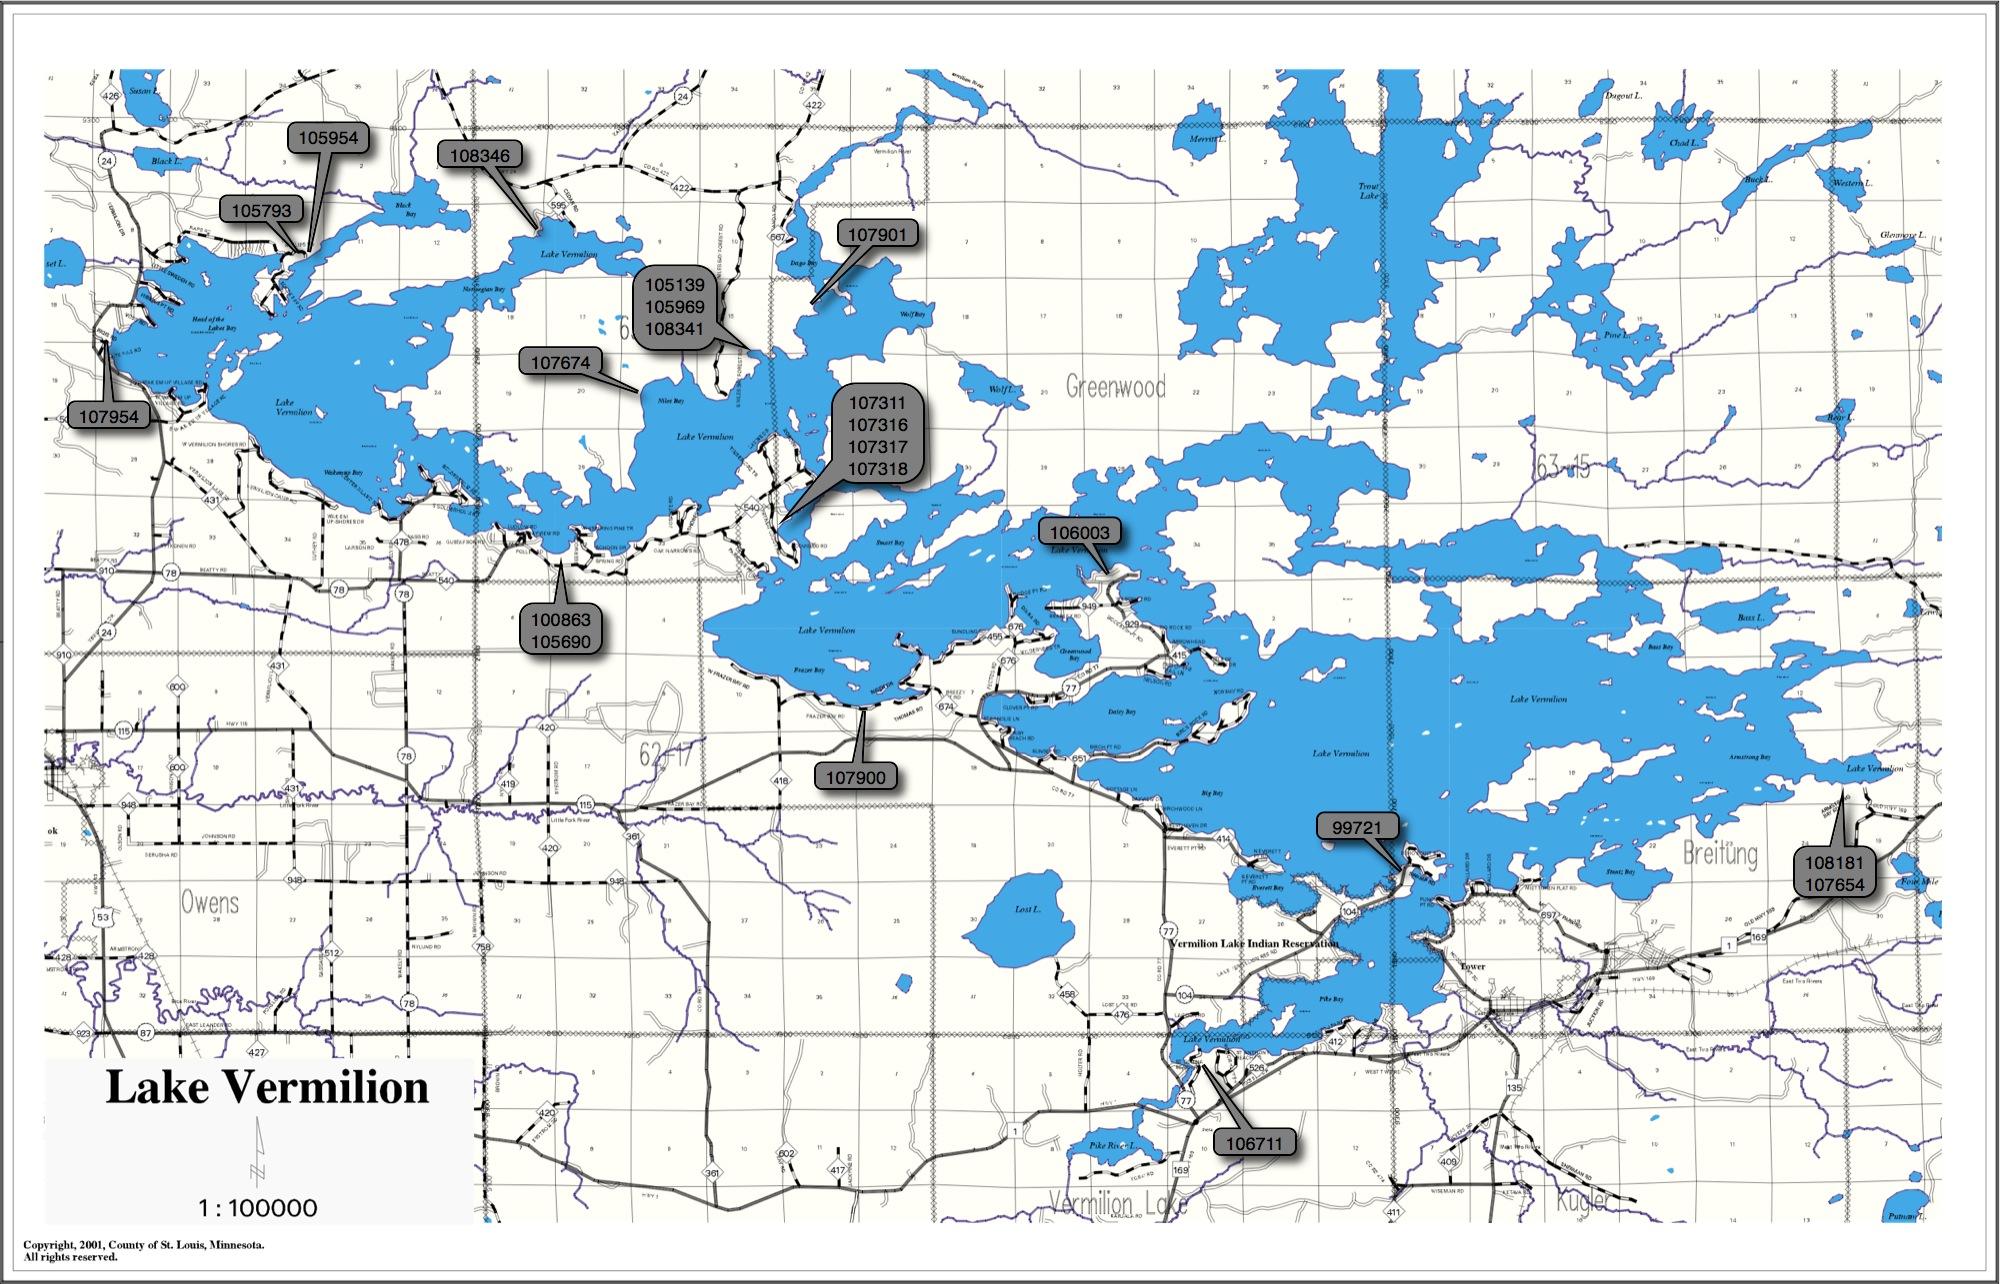 Lake Vermillion Minnesota Map.Lake Vermilion Real Estate Minnesota Lake Cabins Homes And Land